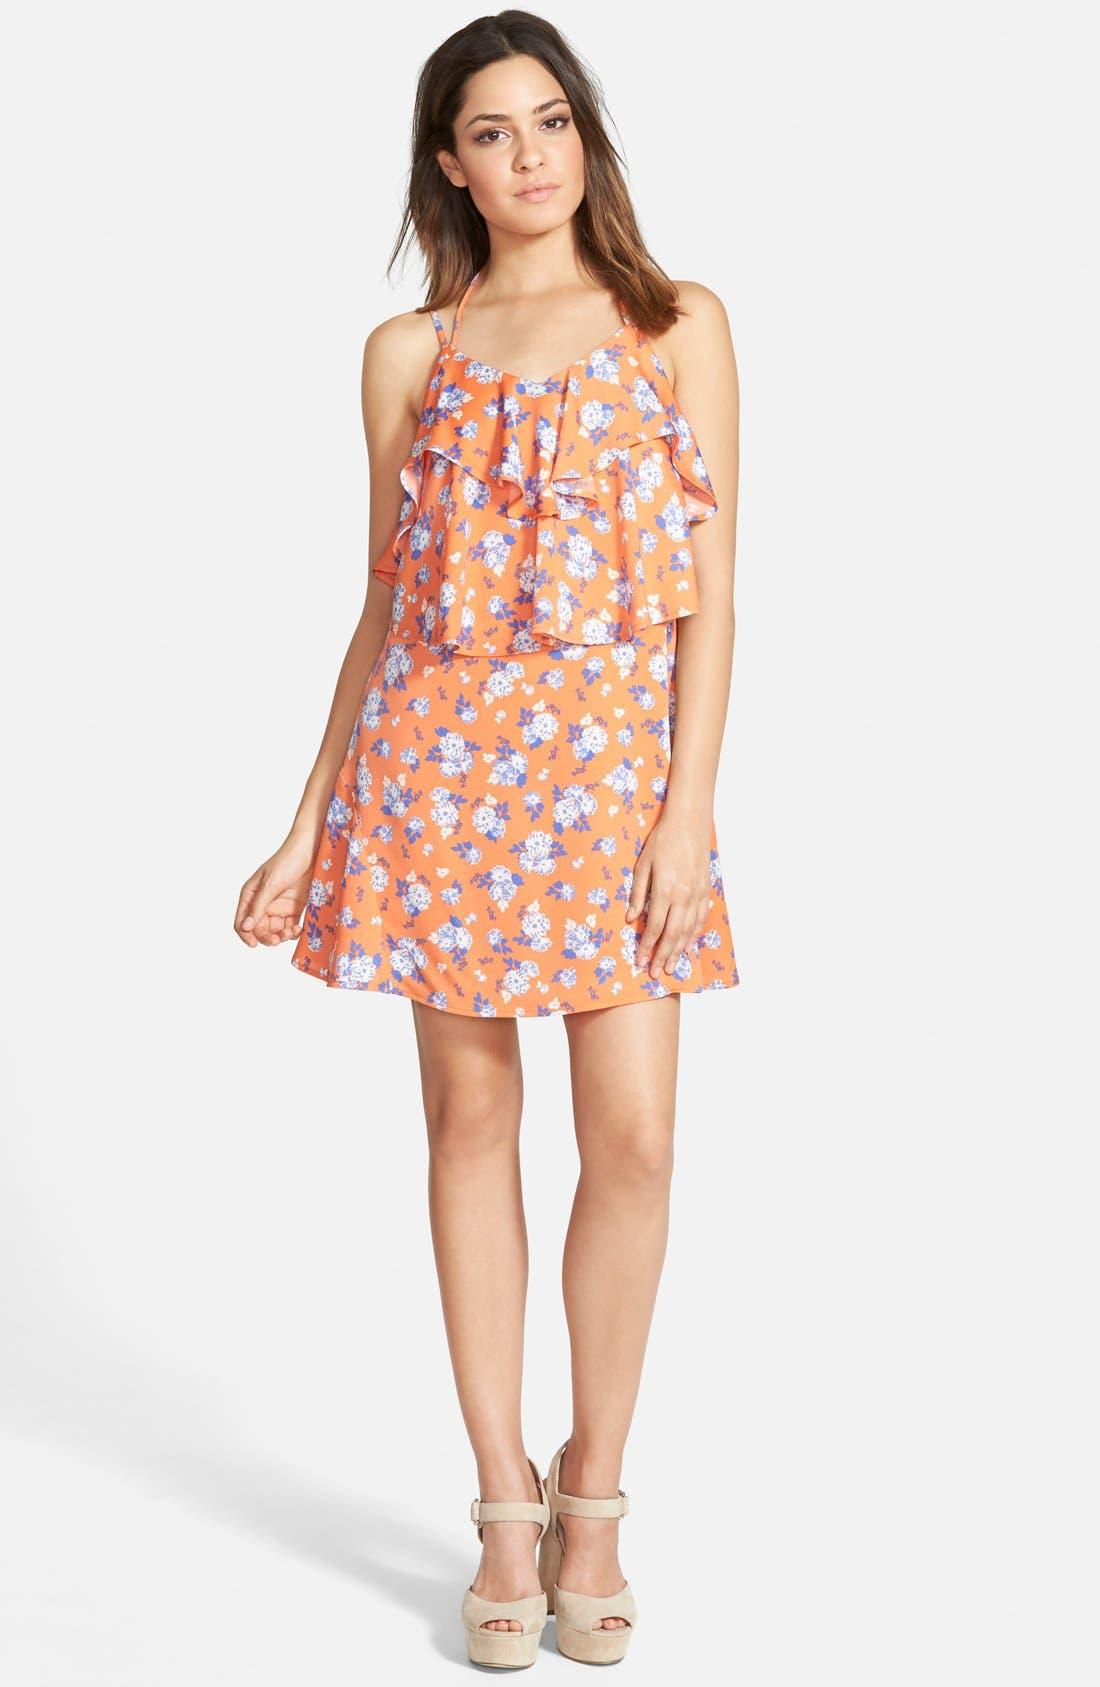 Alternate Image 1 Selected - J.O.A. Print Overlay Dress